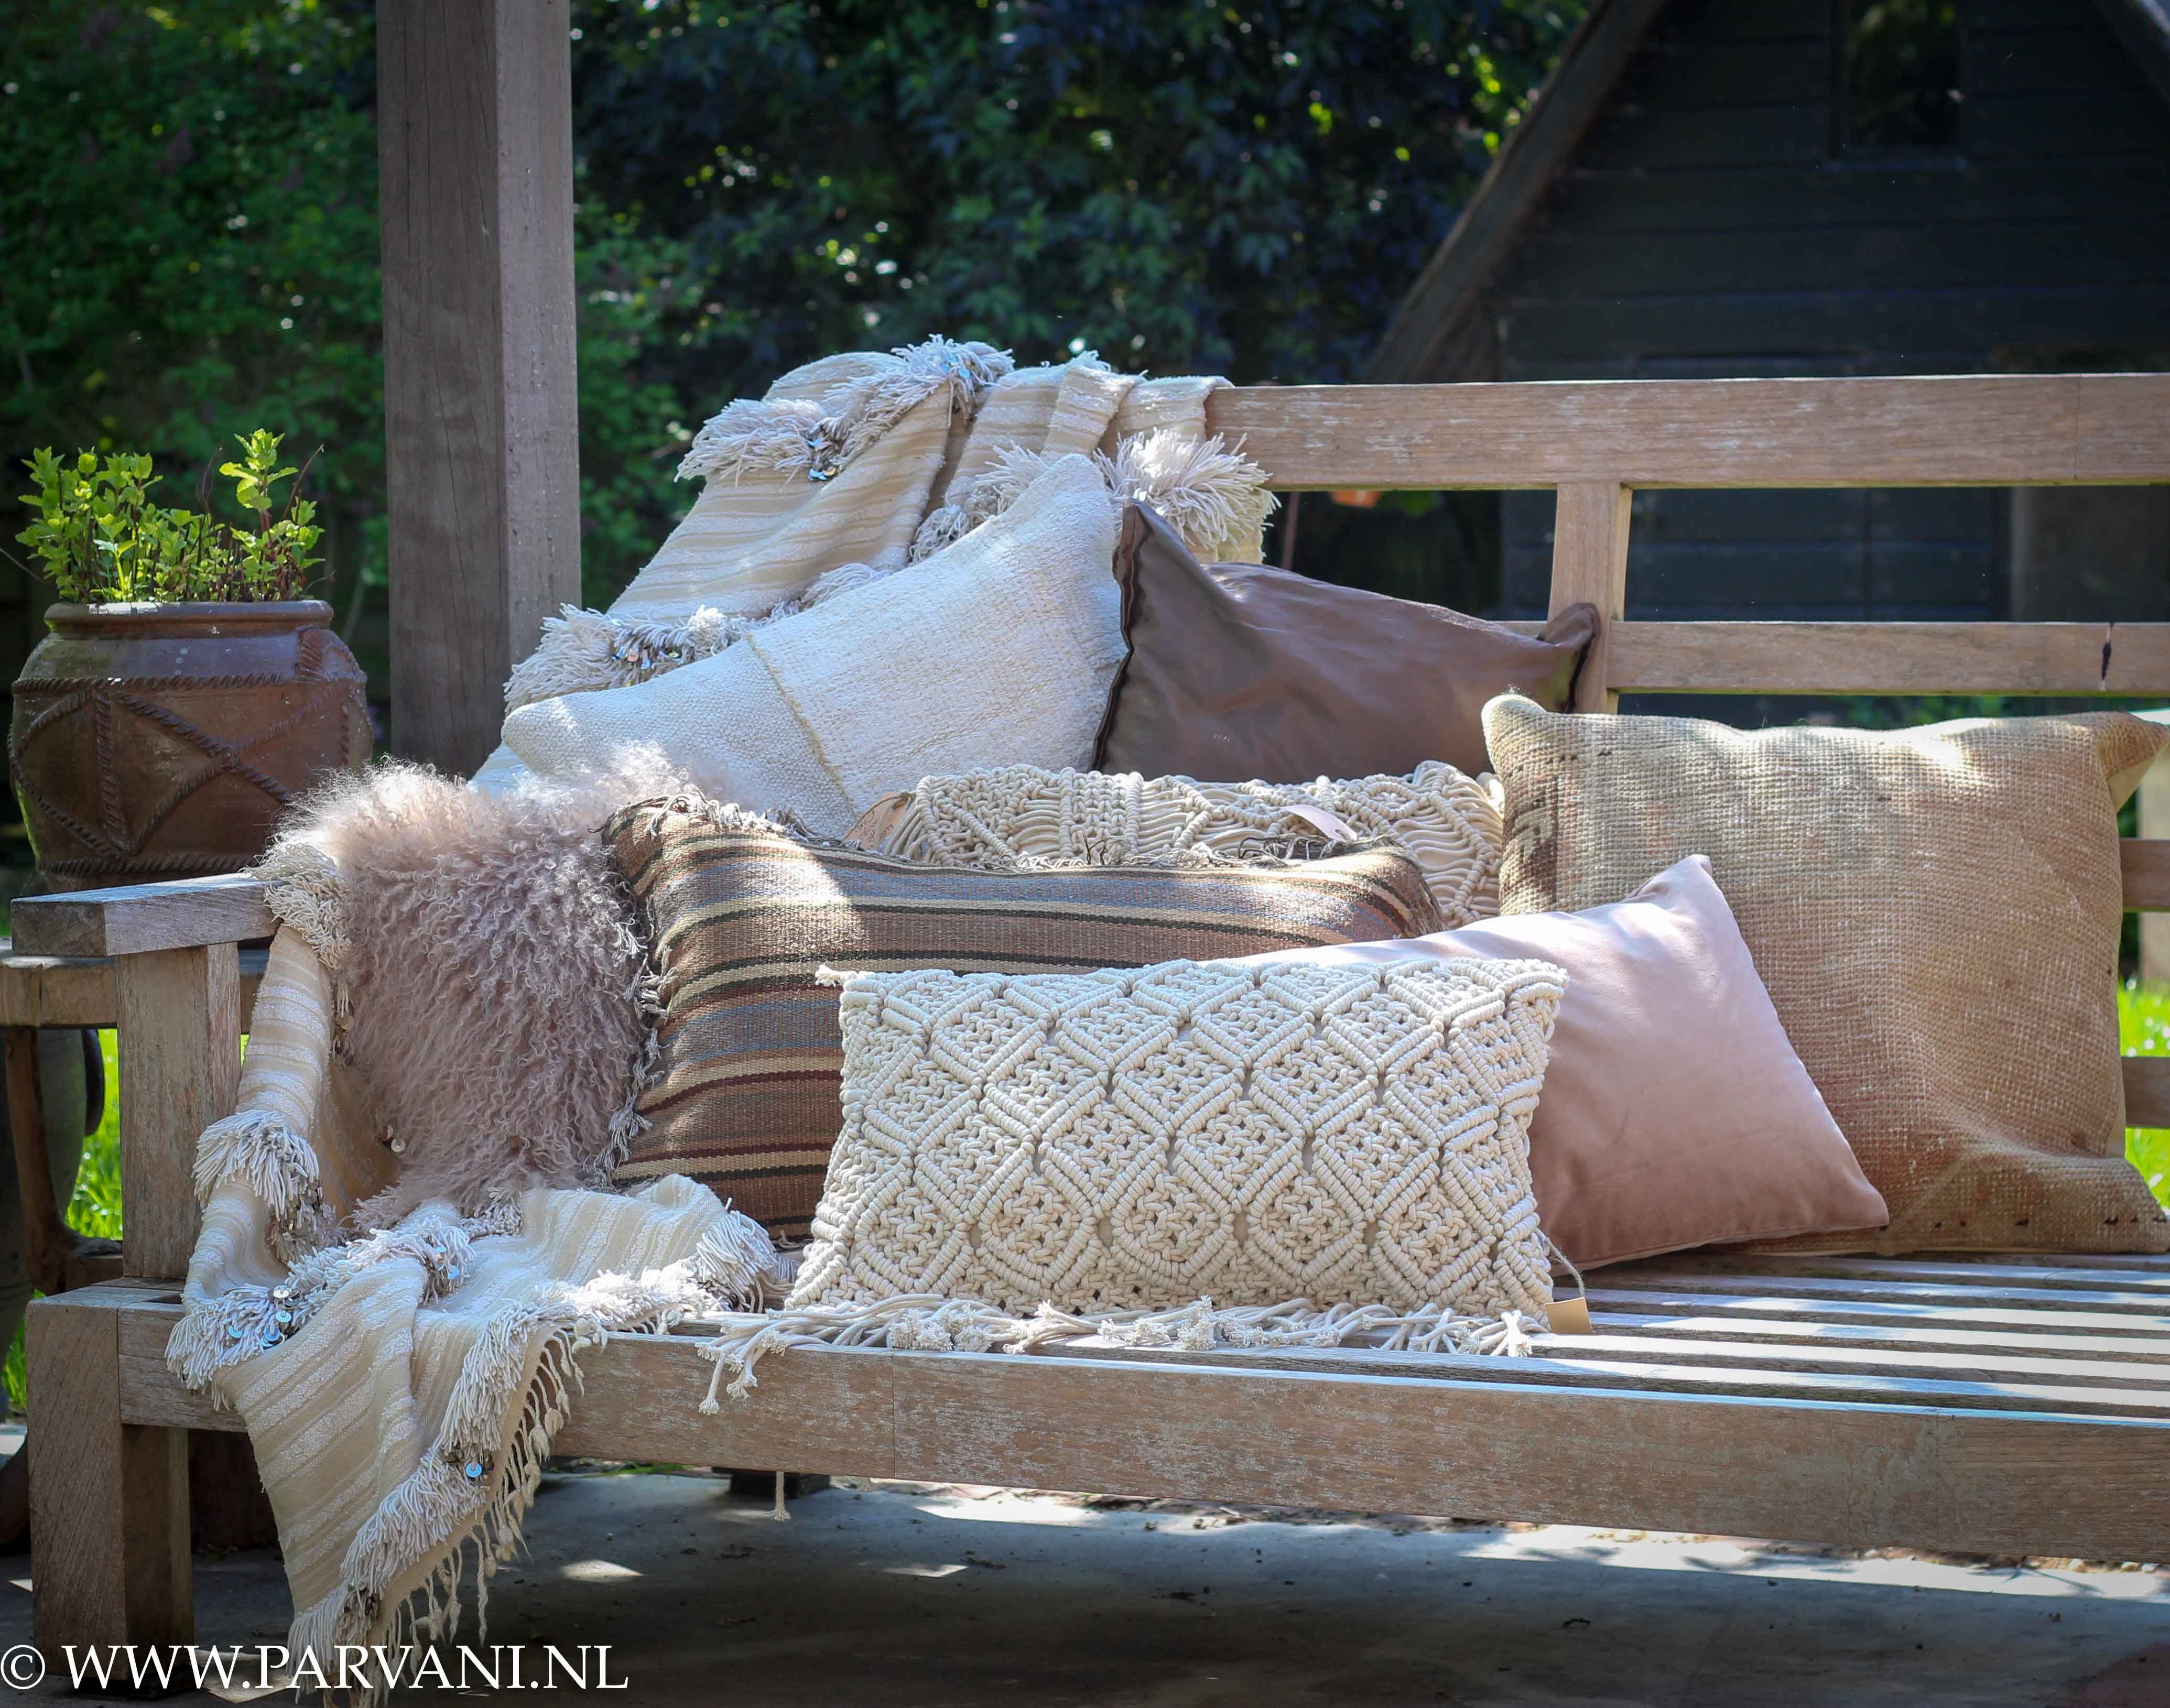 Kussen Oud Roze : Parvani naturel kleurige kussens wit oud roze beige creme